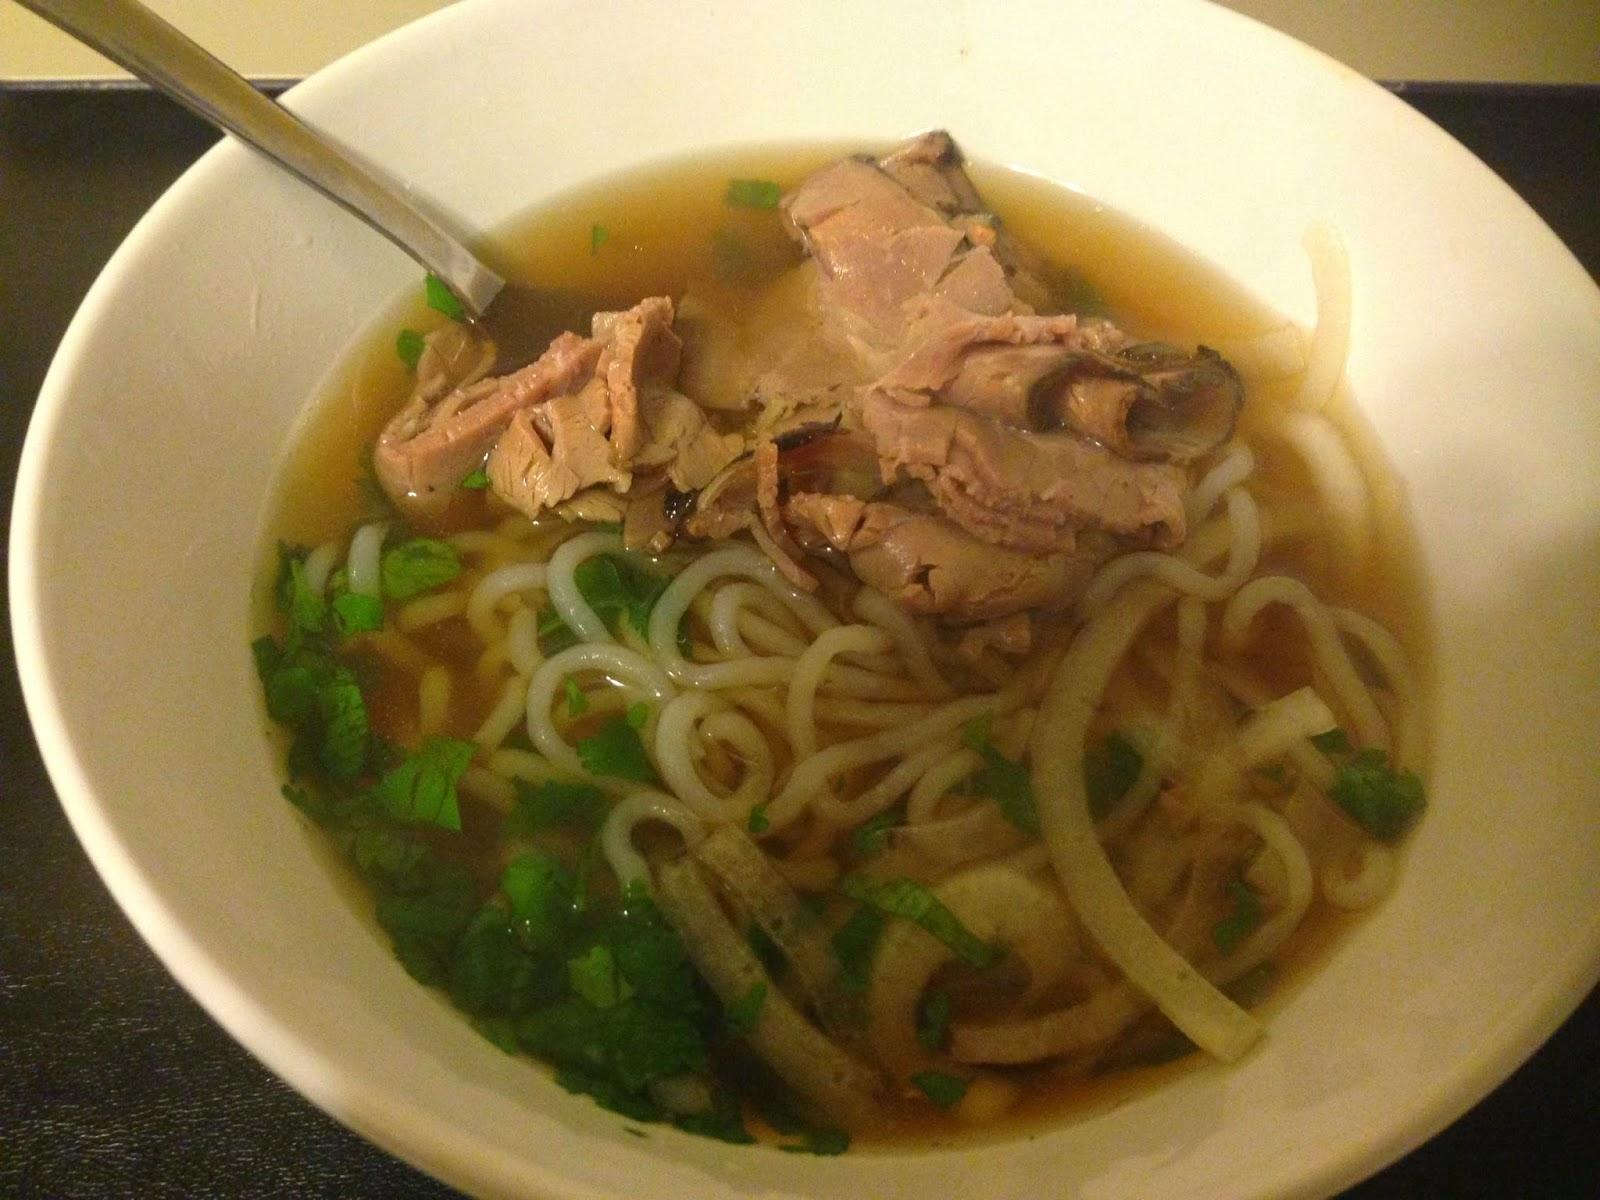 keto diet pho with shirataki noodles